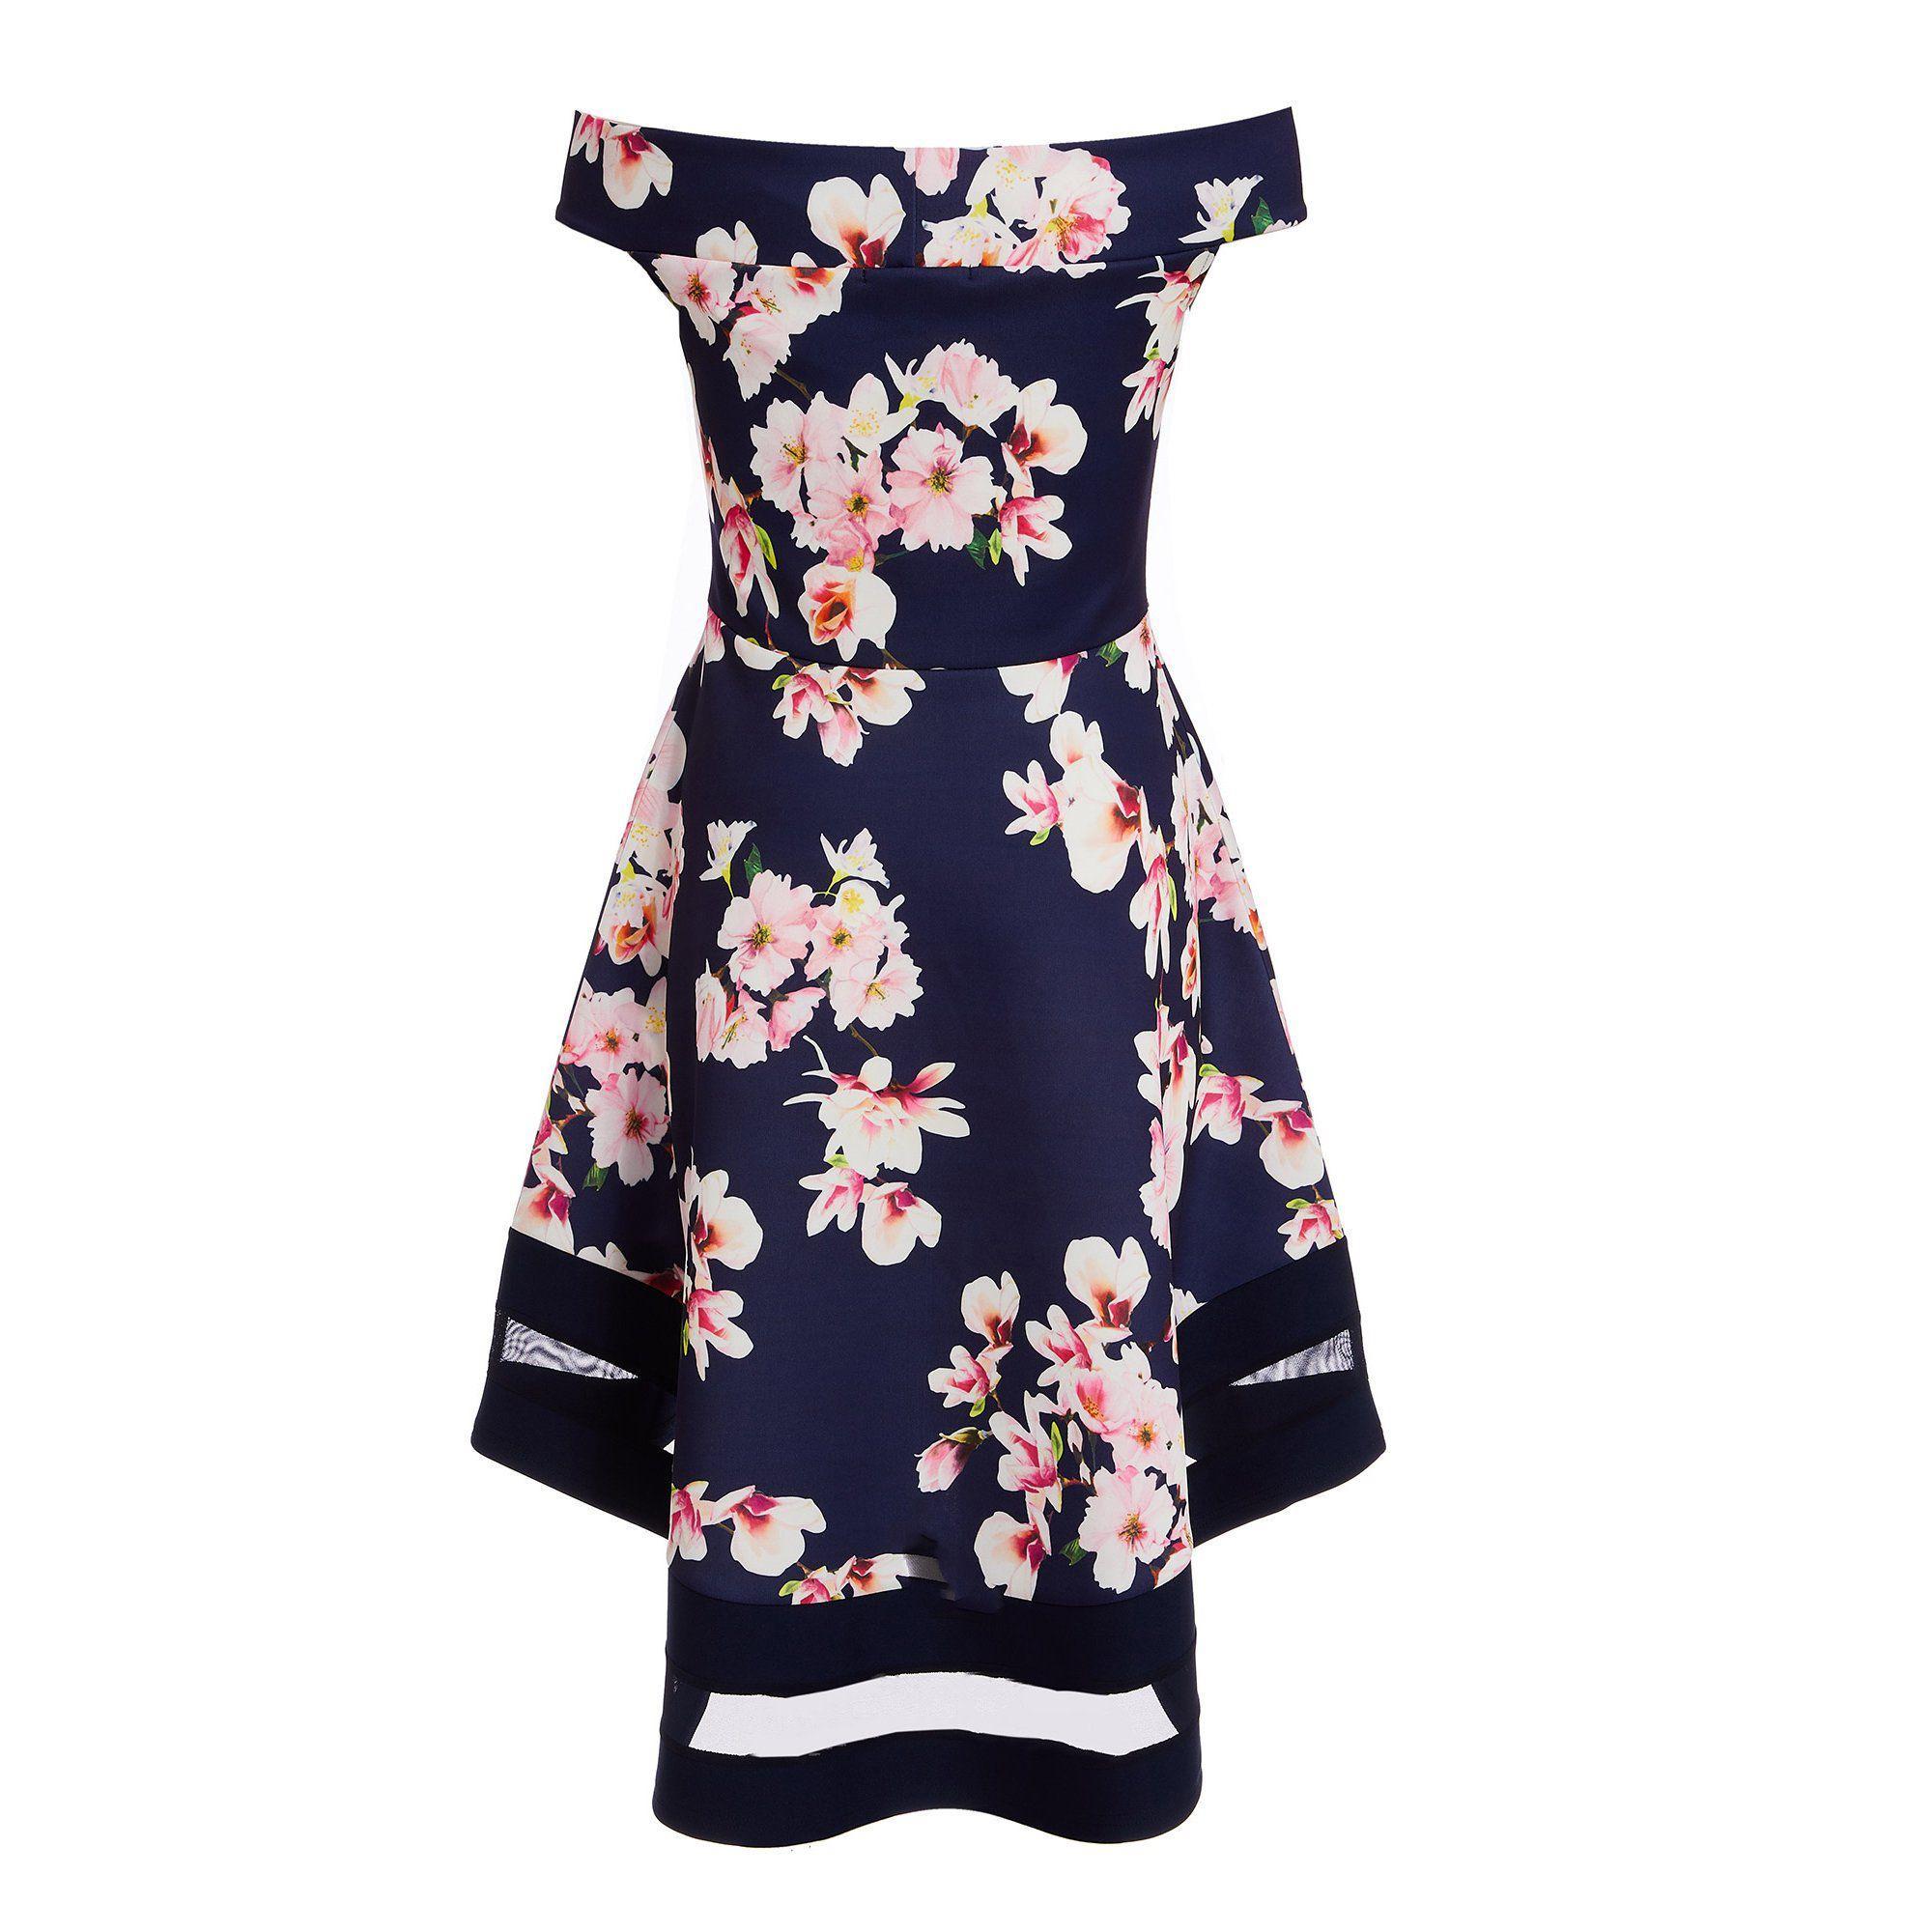 9114a4e345d3 Quiz - Blue Navy Pink And Cream Floral Bardot Dip Hem Dress - Lyst. View  fullscreen